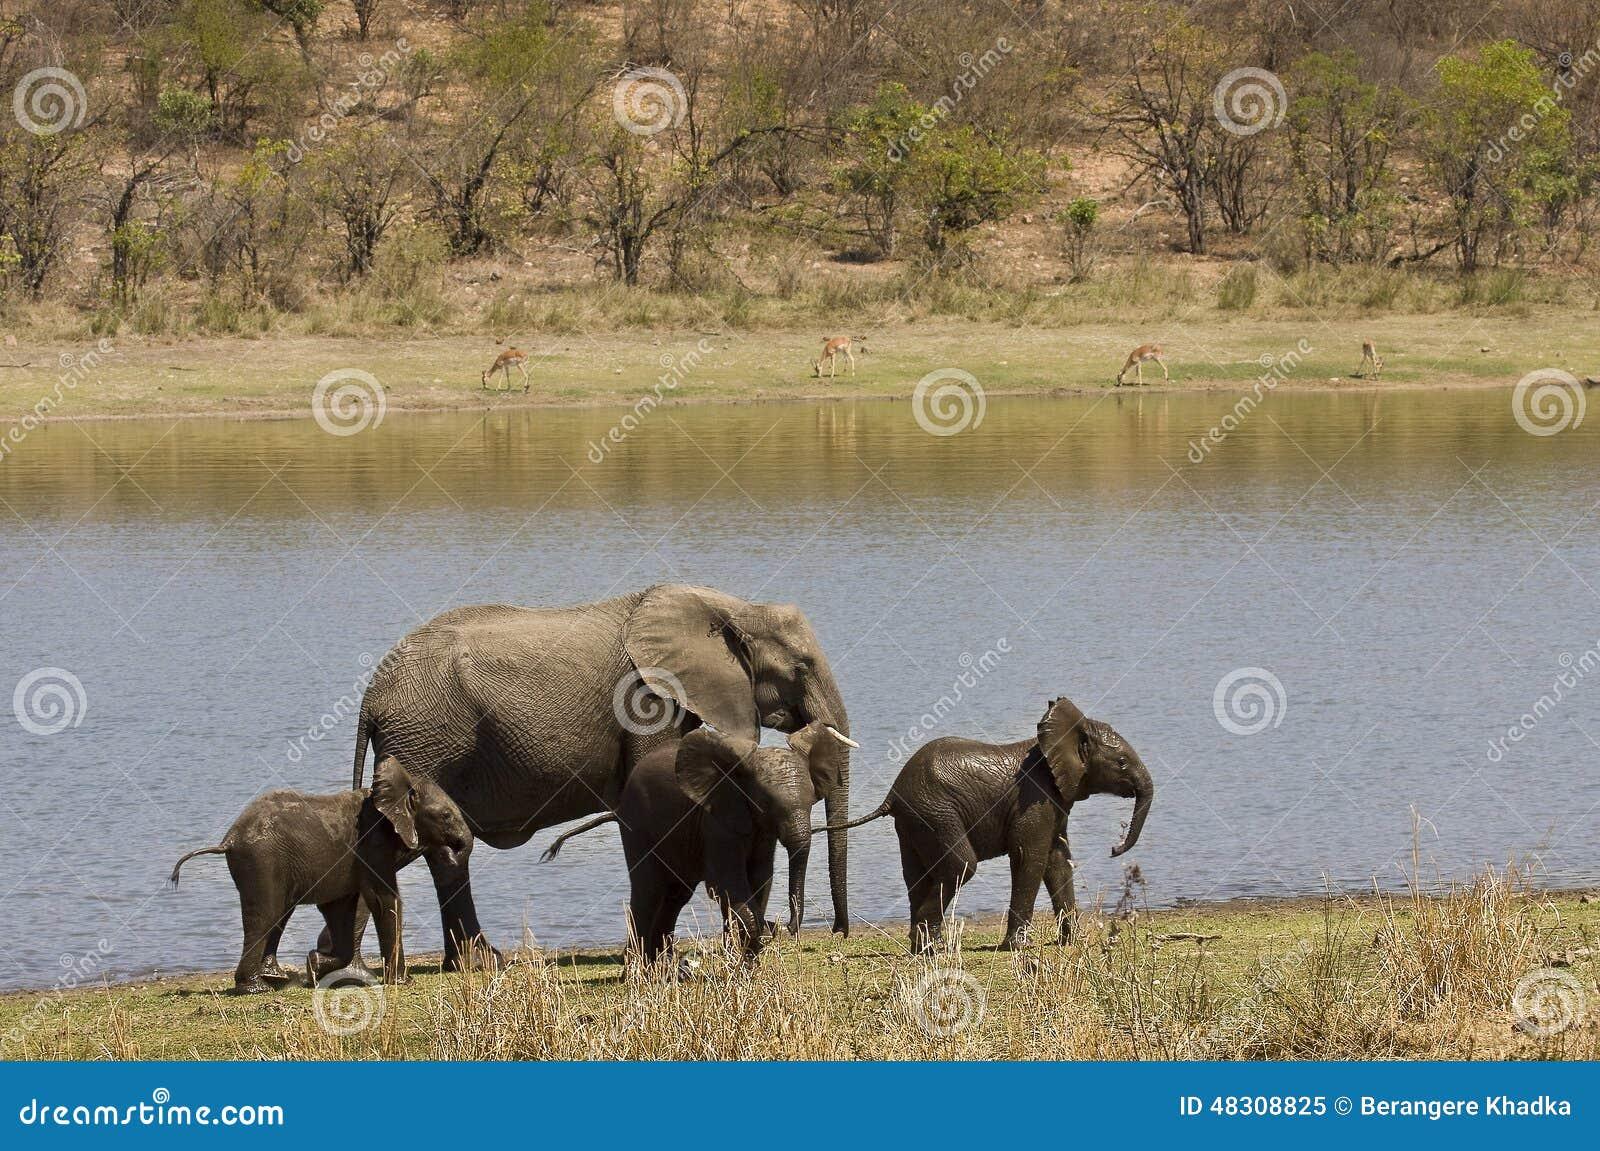 Wilde Elefantfamilie auf der Flussbank, Nationalpark Kruger, SÜDAFRIKA